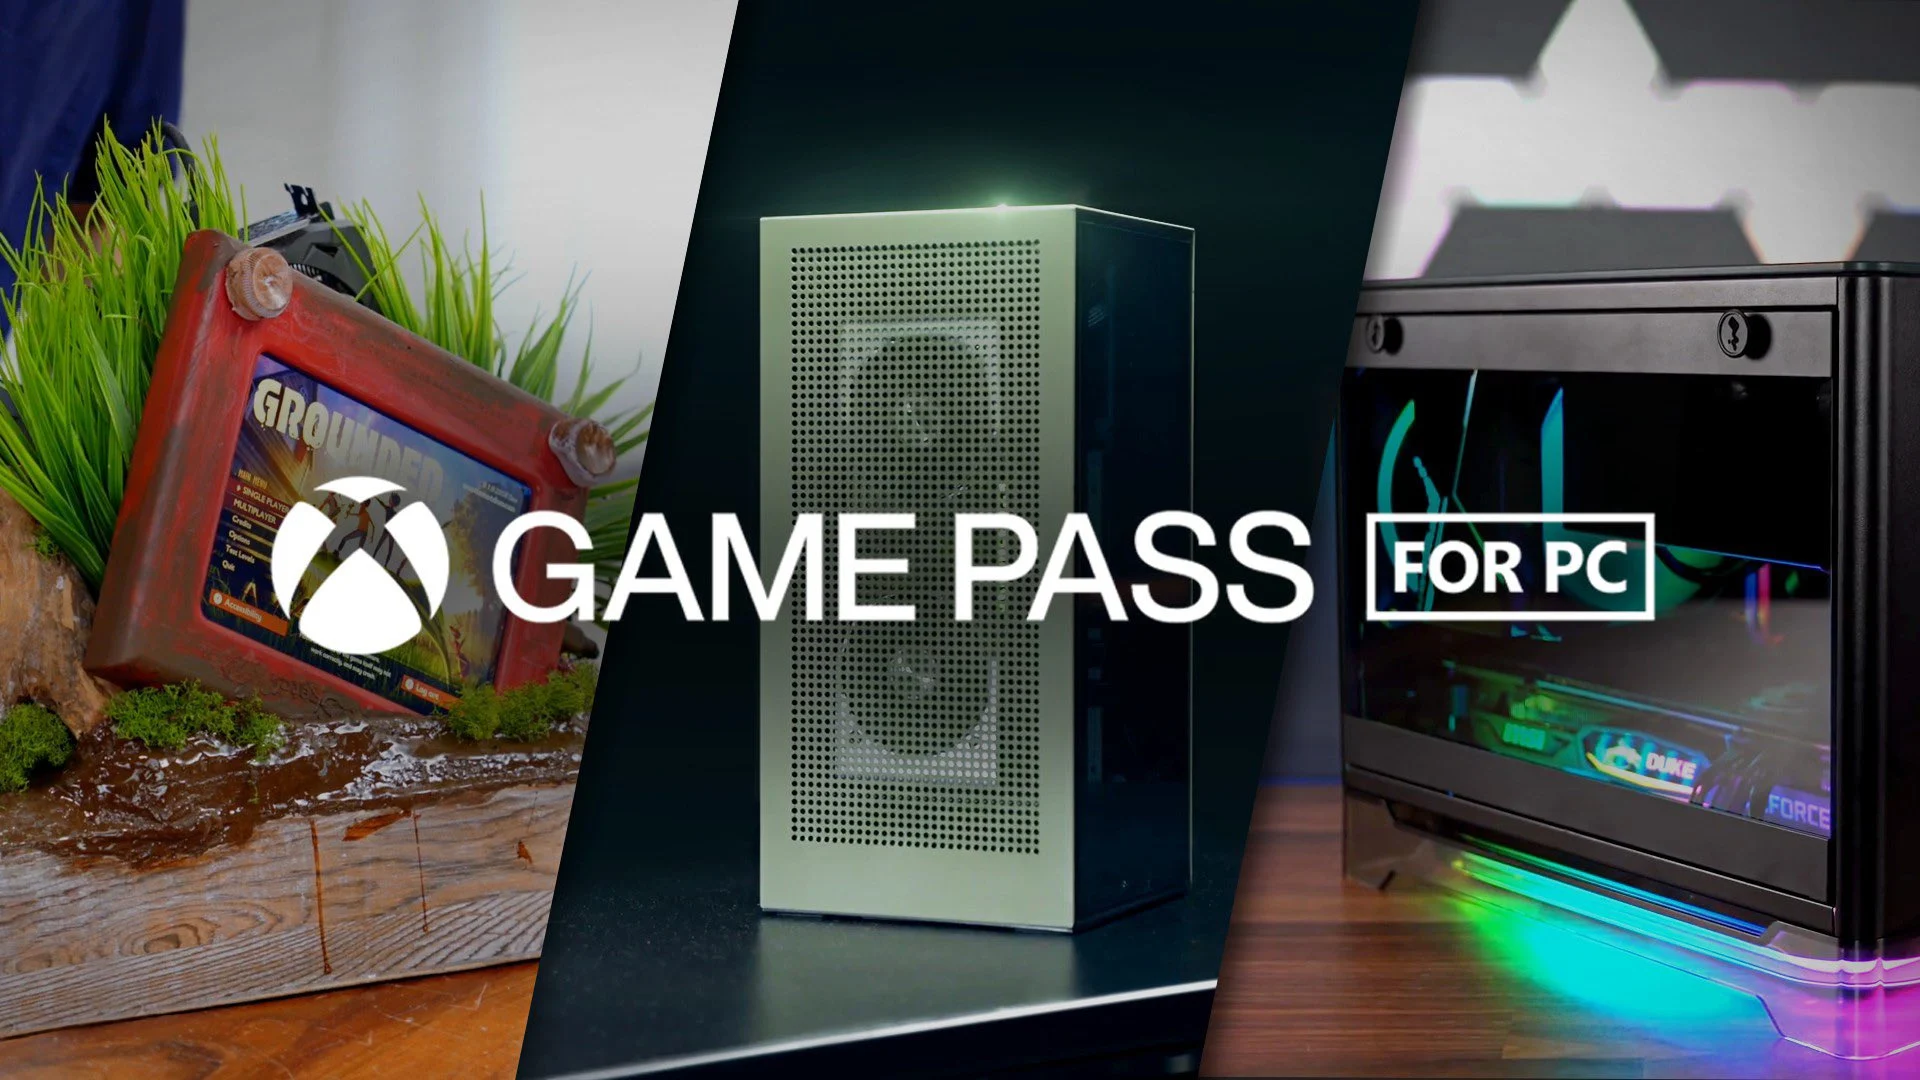 Xbox Game Pass - Lv1 Gaming